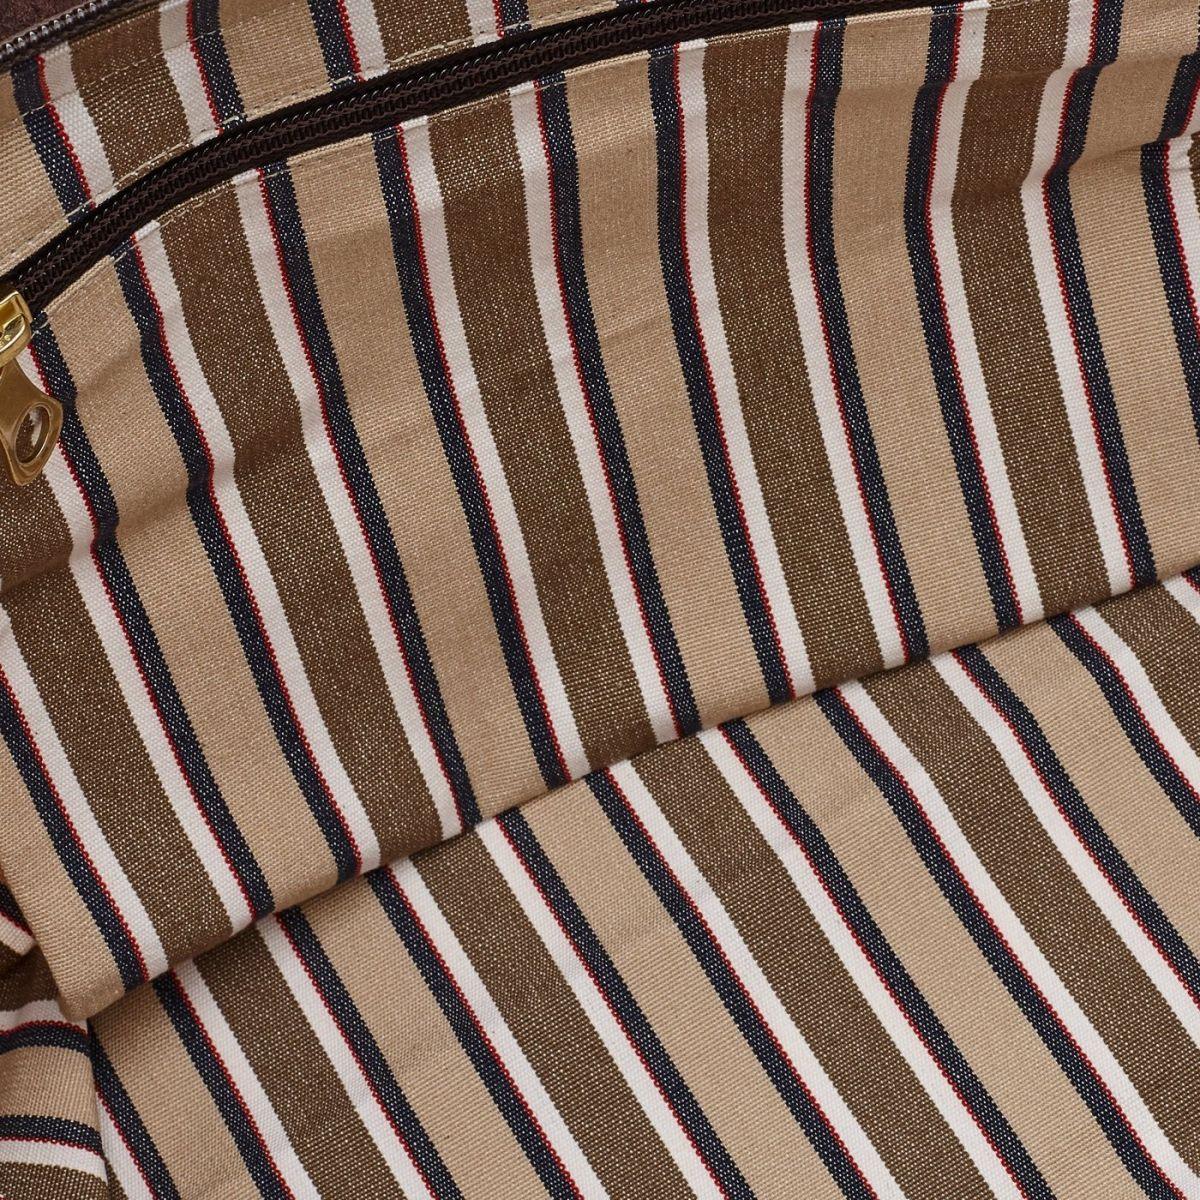 Caramella  - Women's Shoulder Bag  in Striped Cotton Canvas BSH112 color Multicolor | Details